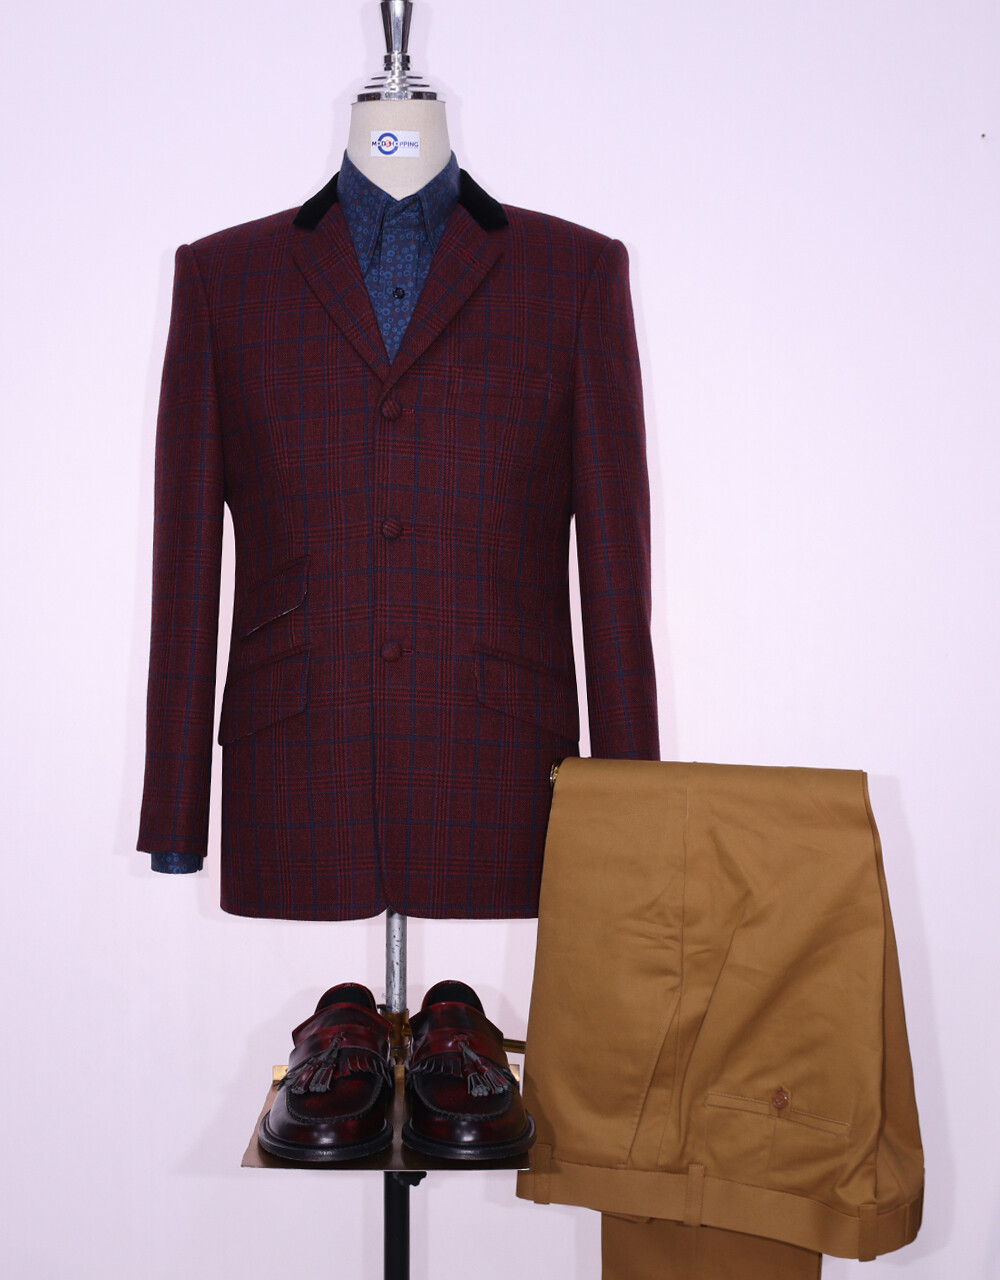 Tweed Jacket   Burgundy Prince Of Wales Check 60s Style Jacket.